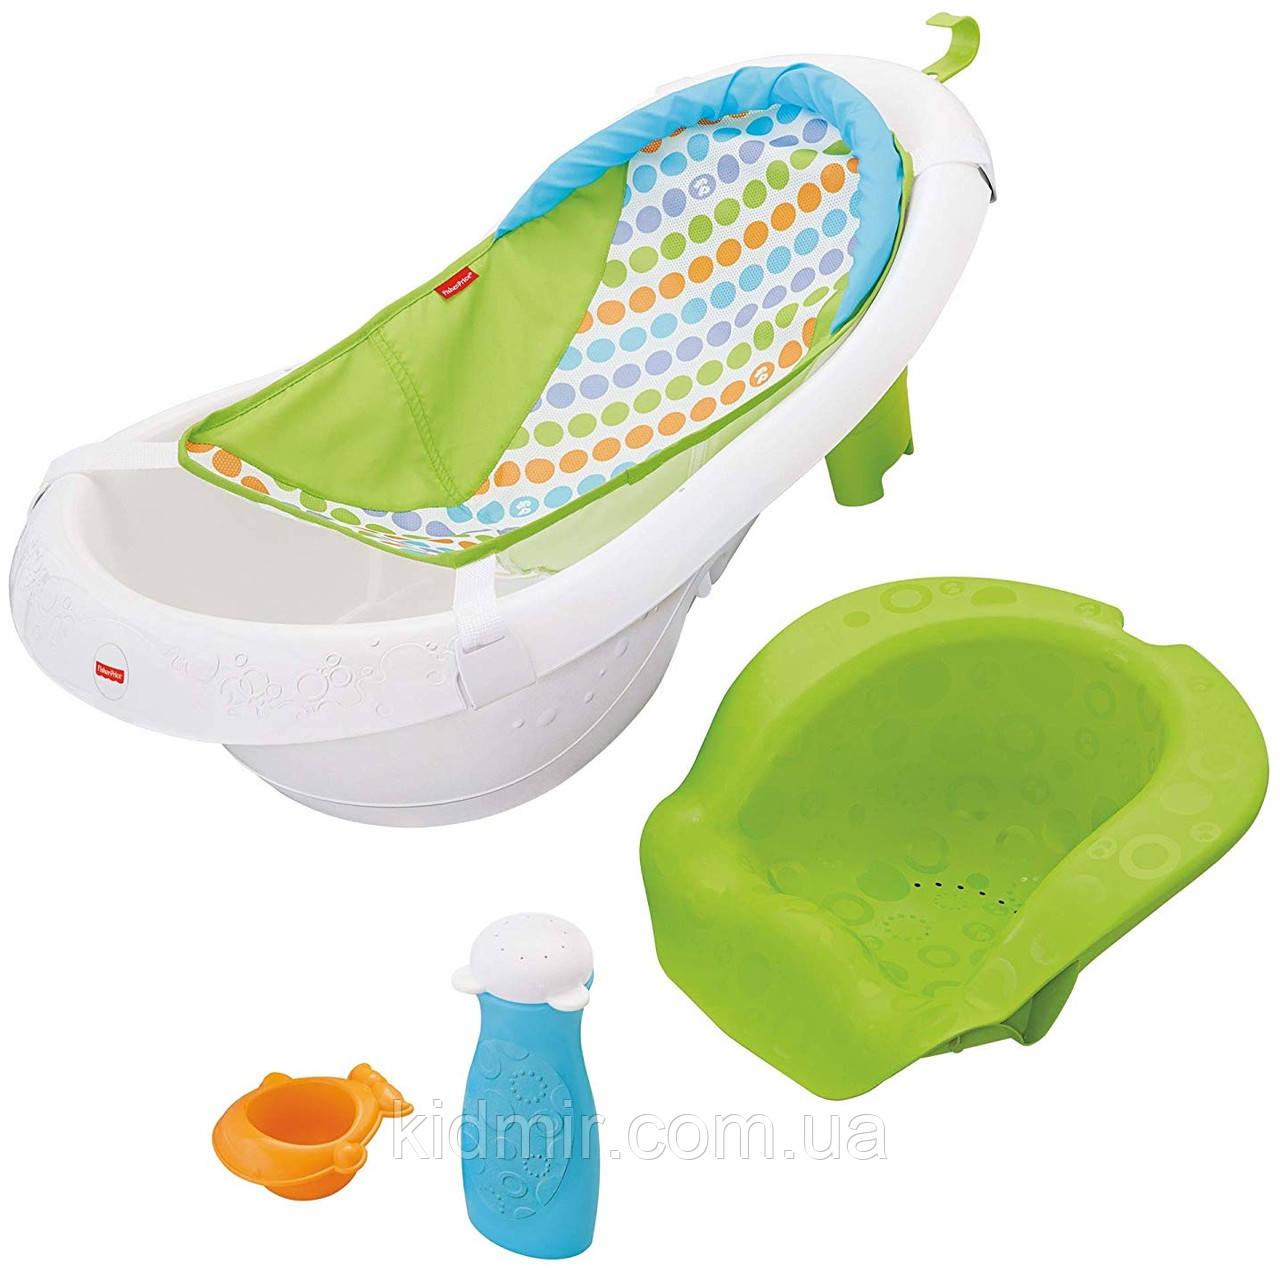 Ванночка 4 в 1 Расти со мной Fisher-Price Sling Seat Tub